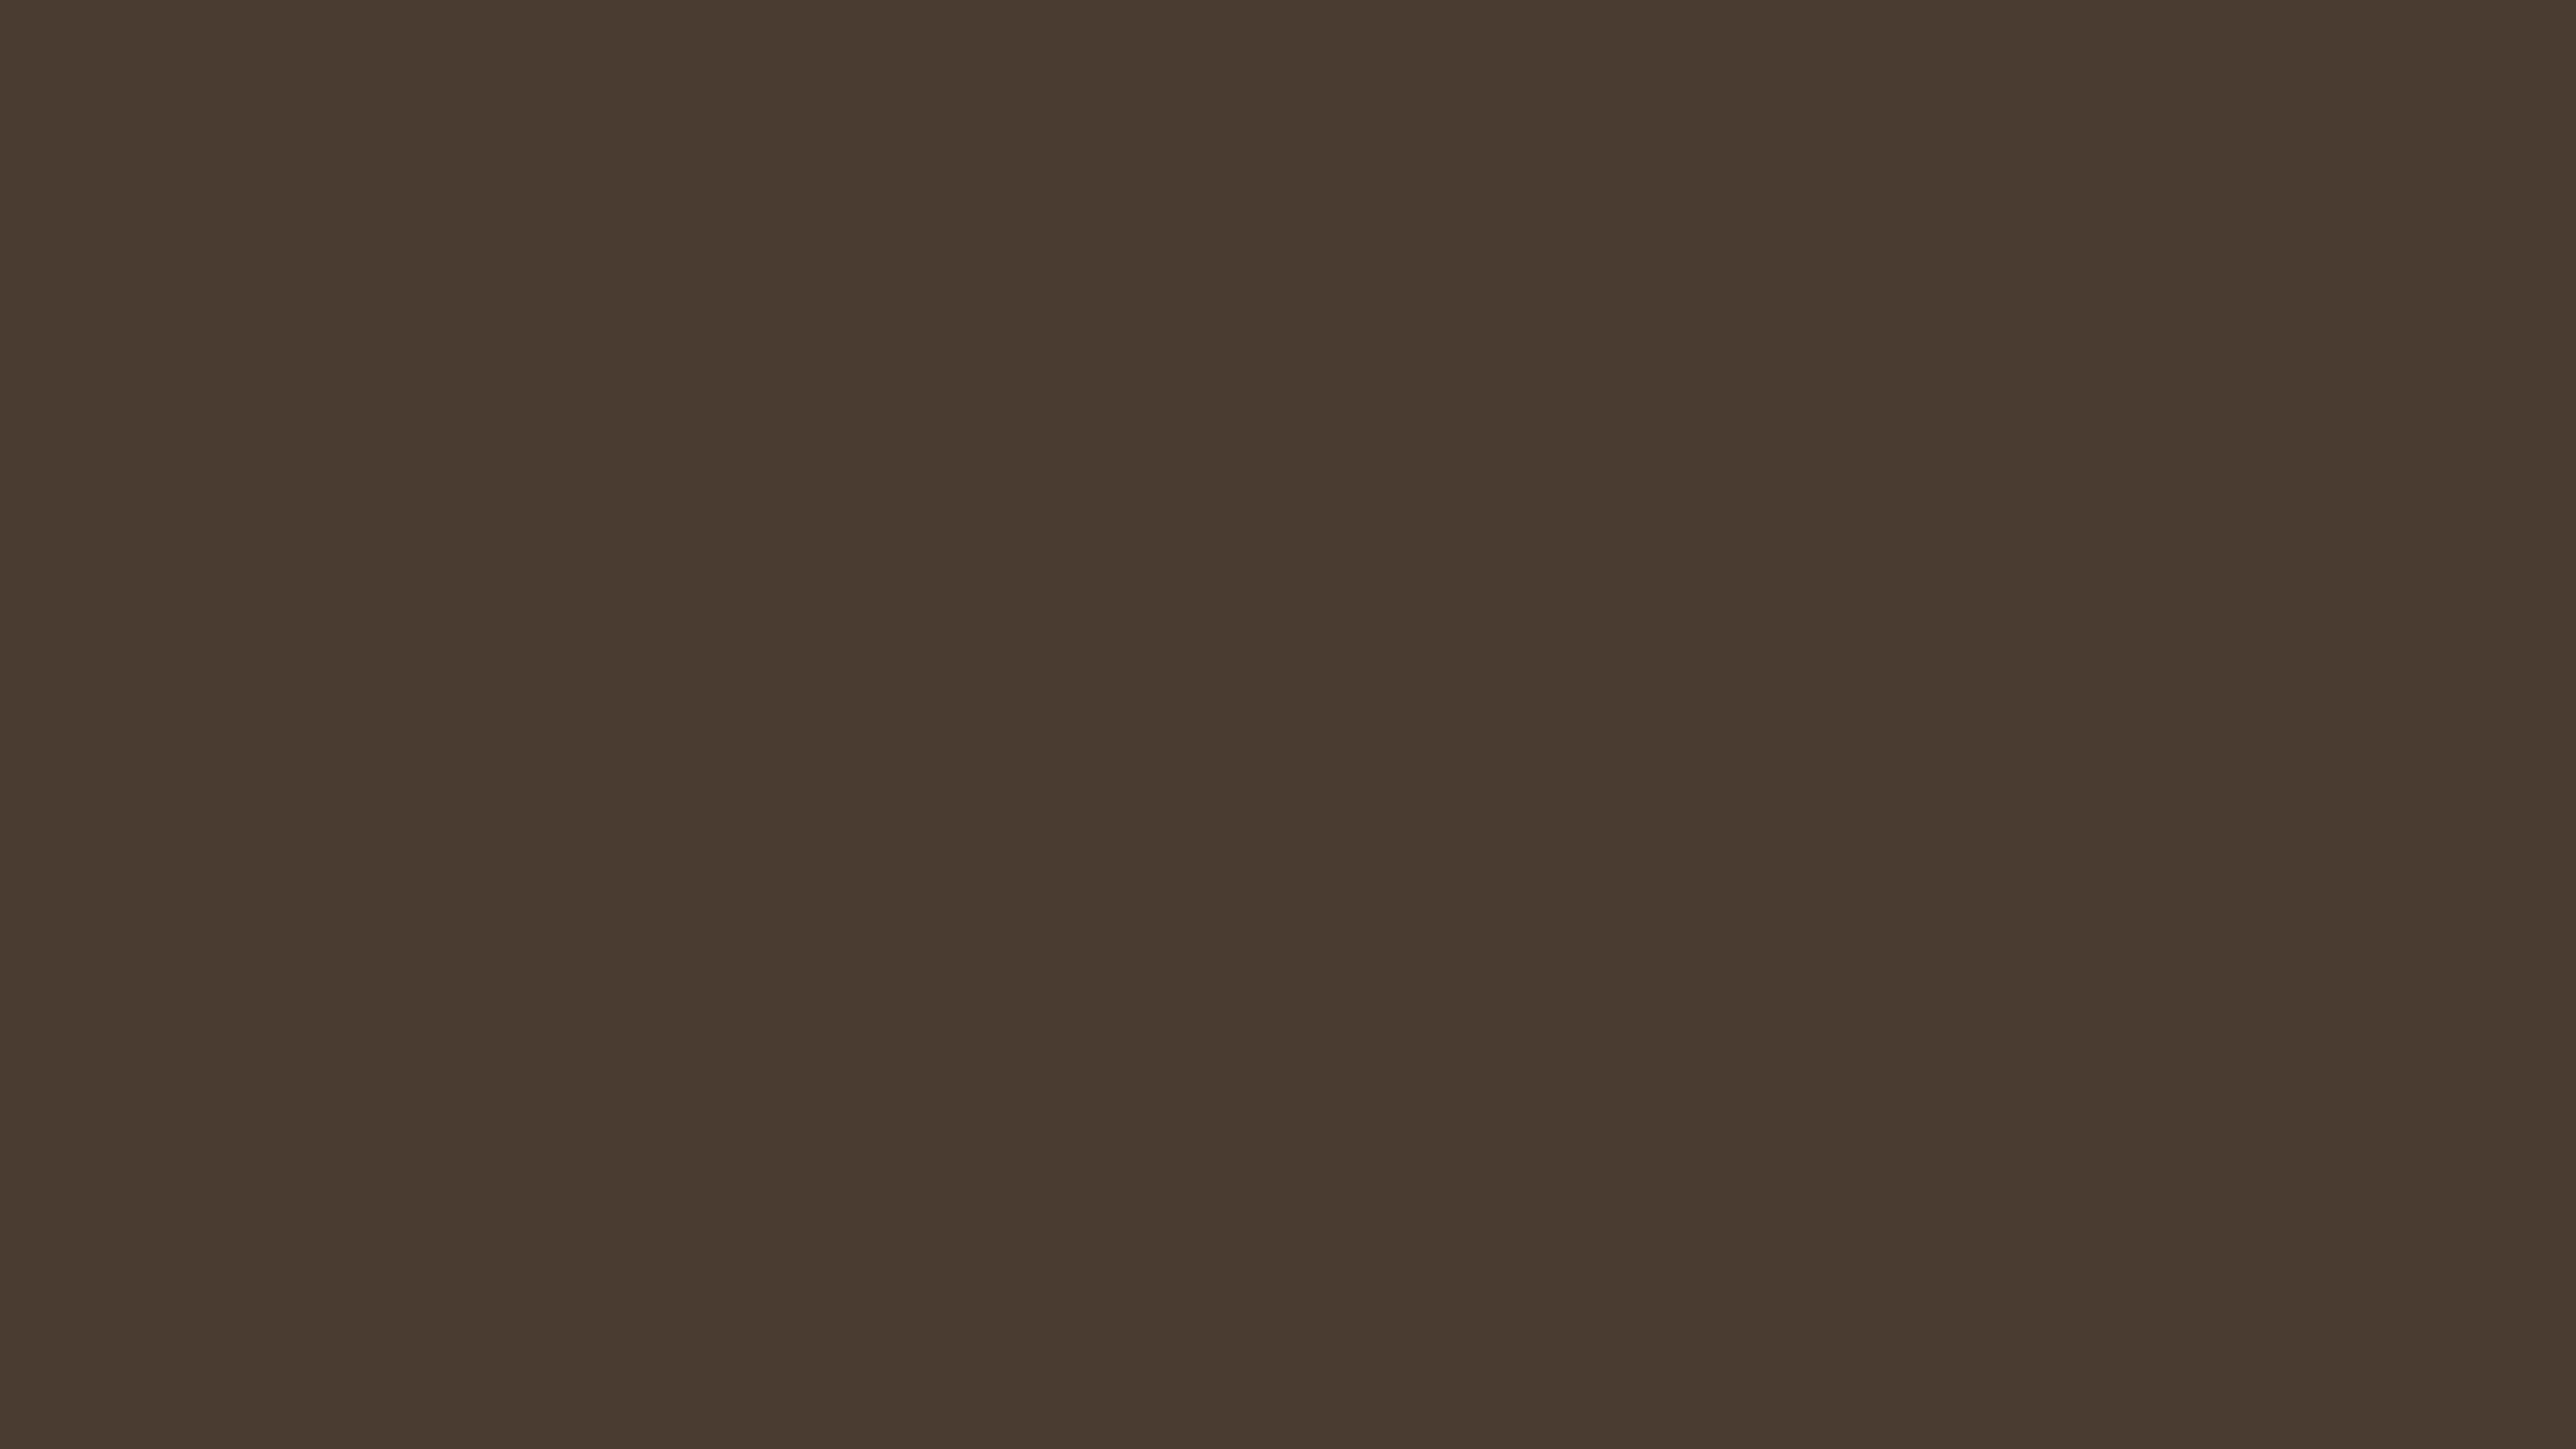 3840x2160 Dark Lava Solid Color Background